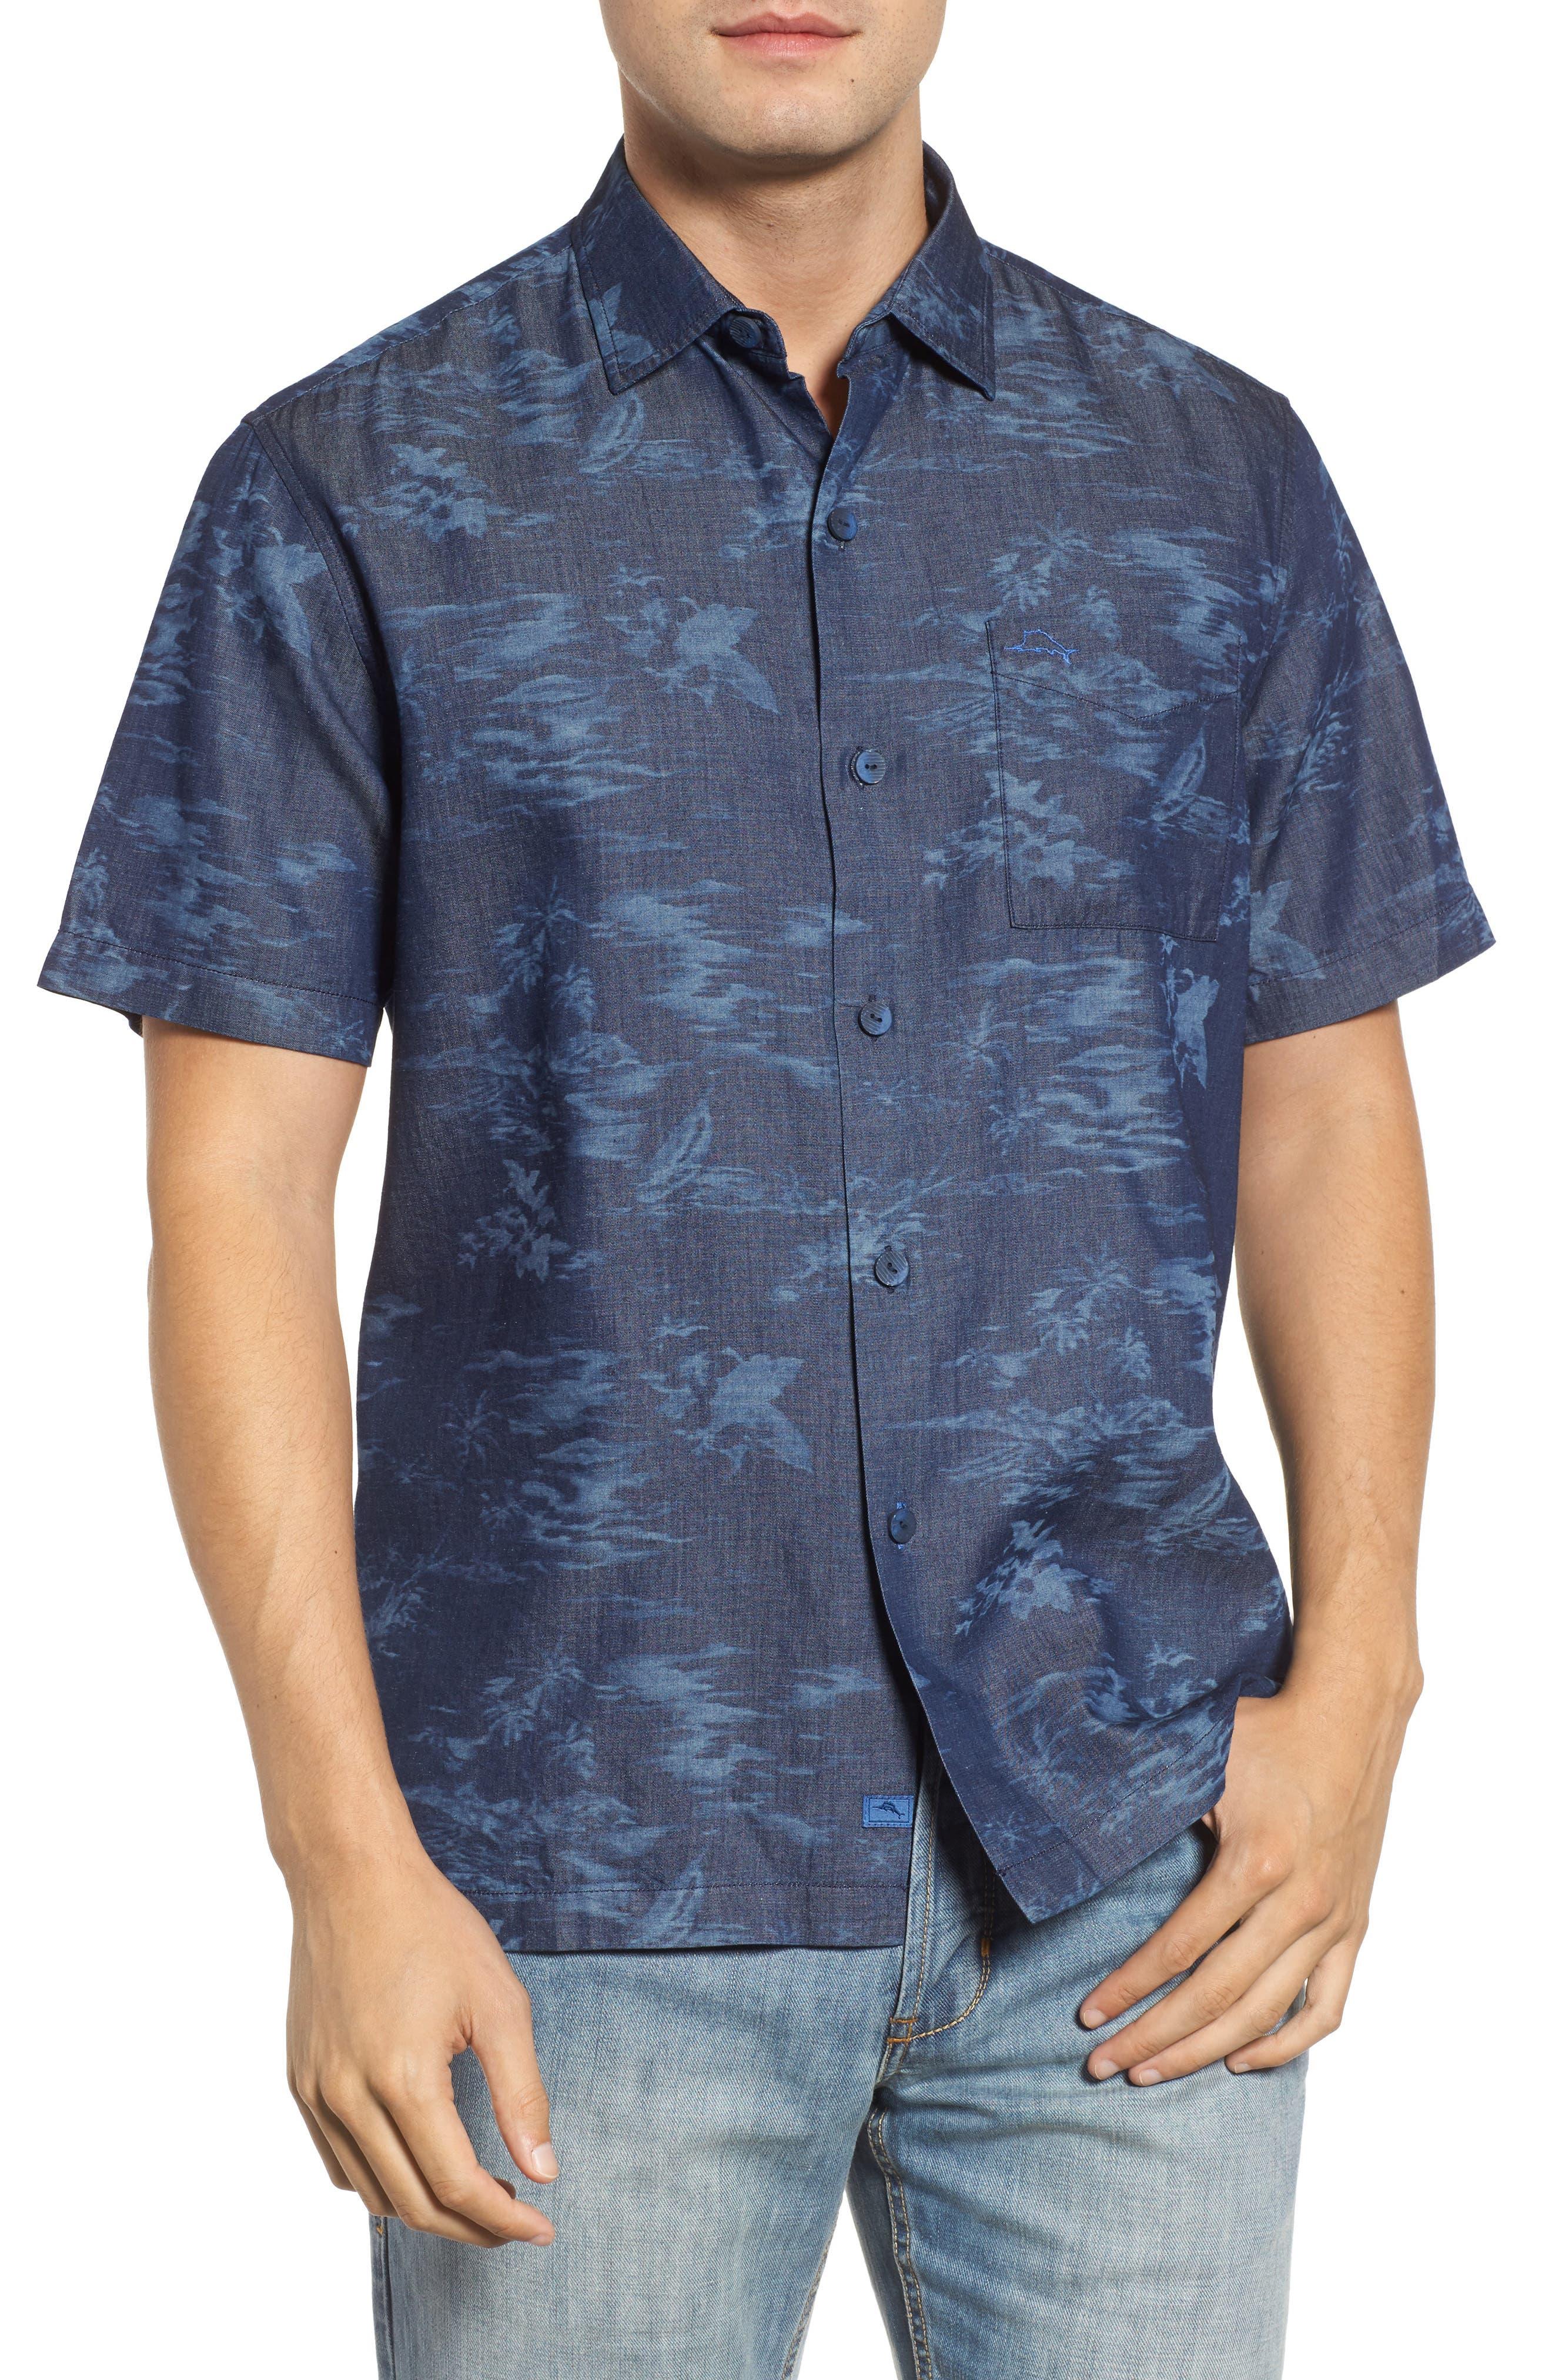 South Beach Scenic Cotton & Silk Camp Shirt,                             Main thumbnail 1, color,                             Indigo